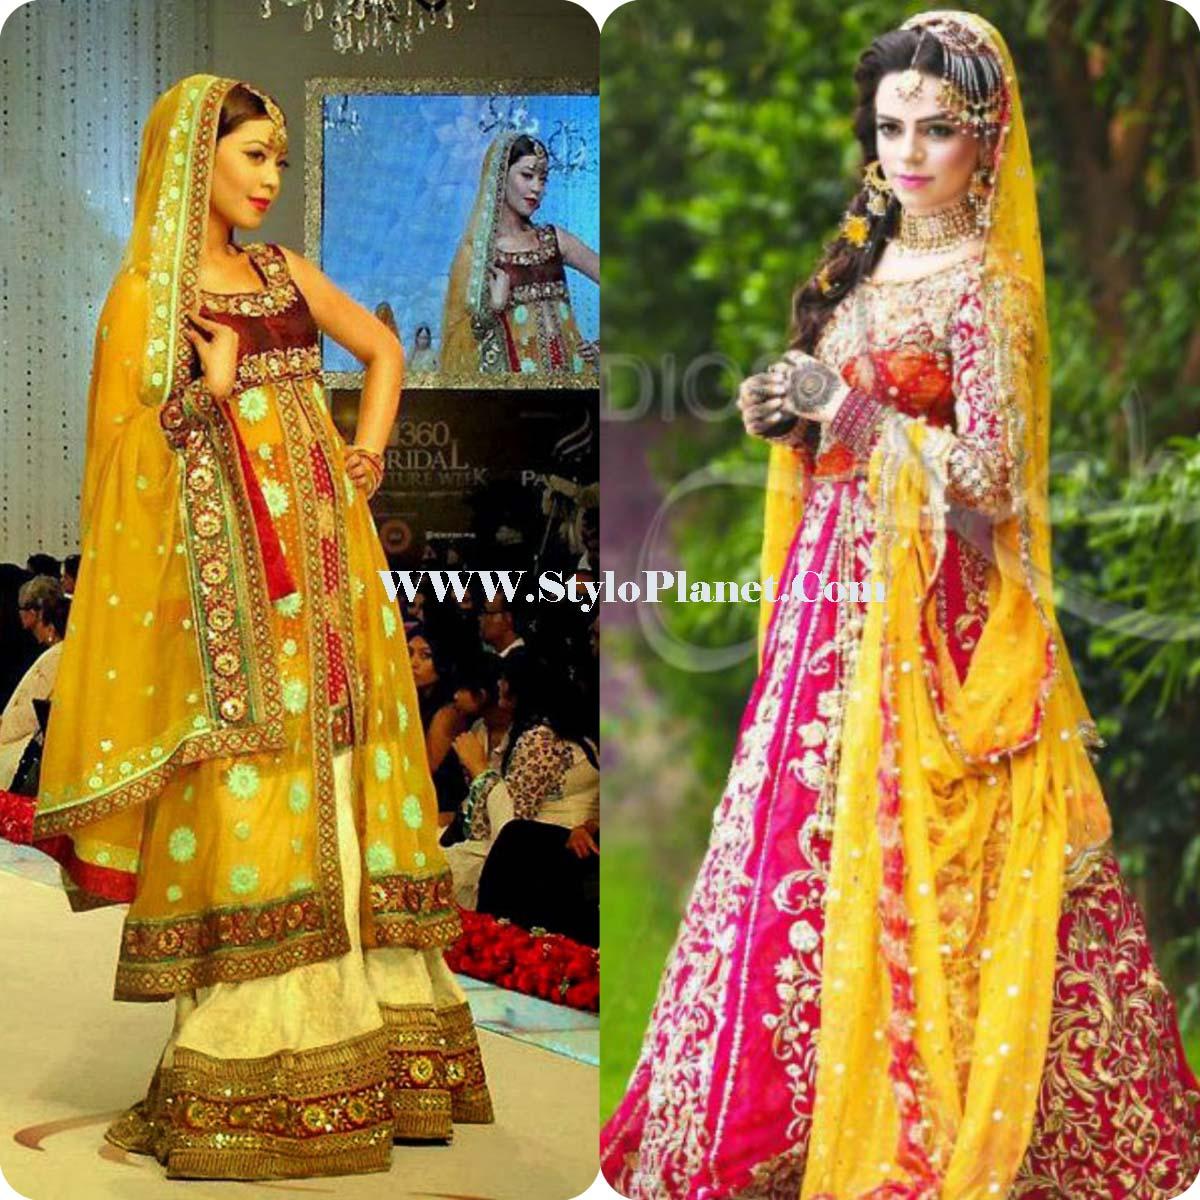 Mehndi Party Dresses 2018 : Mayoun mehndi latest dresses for bridals stylo planet